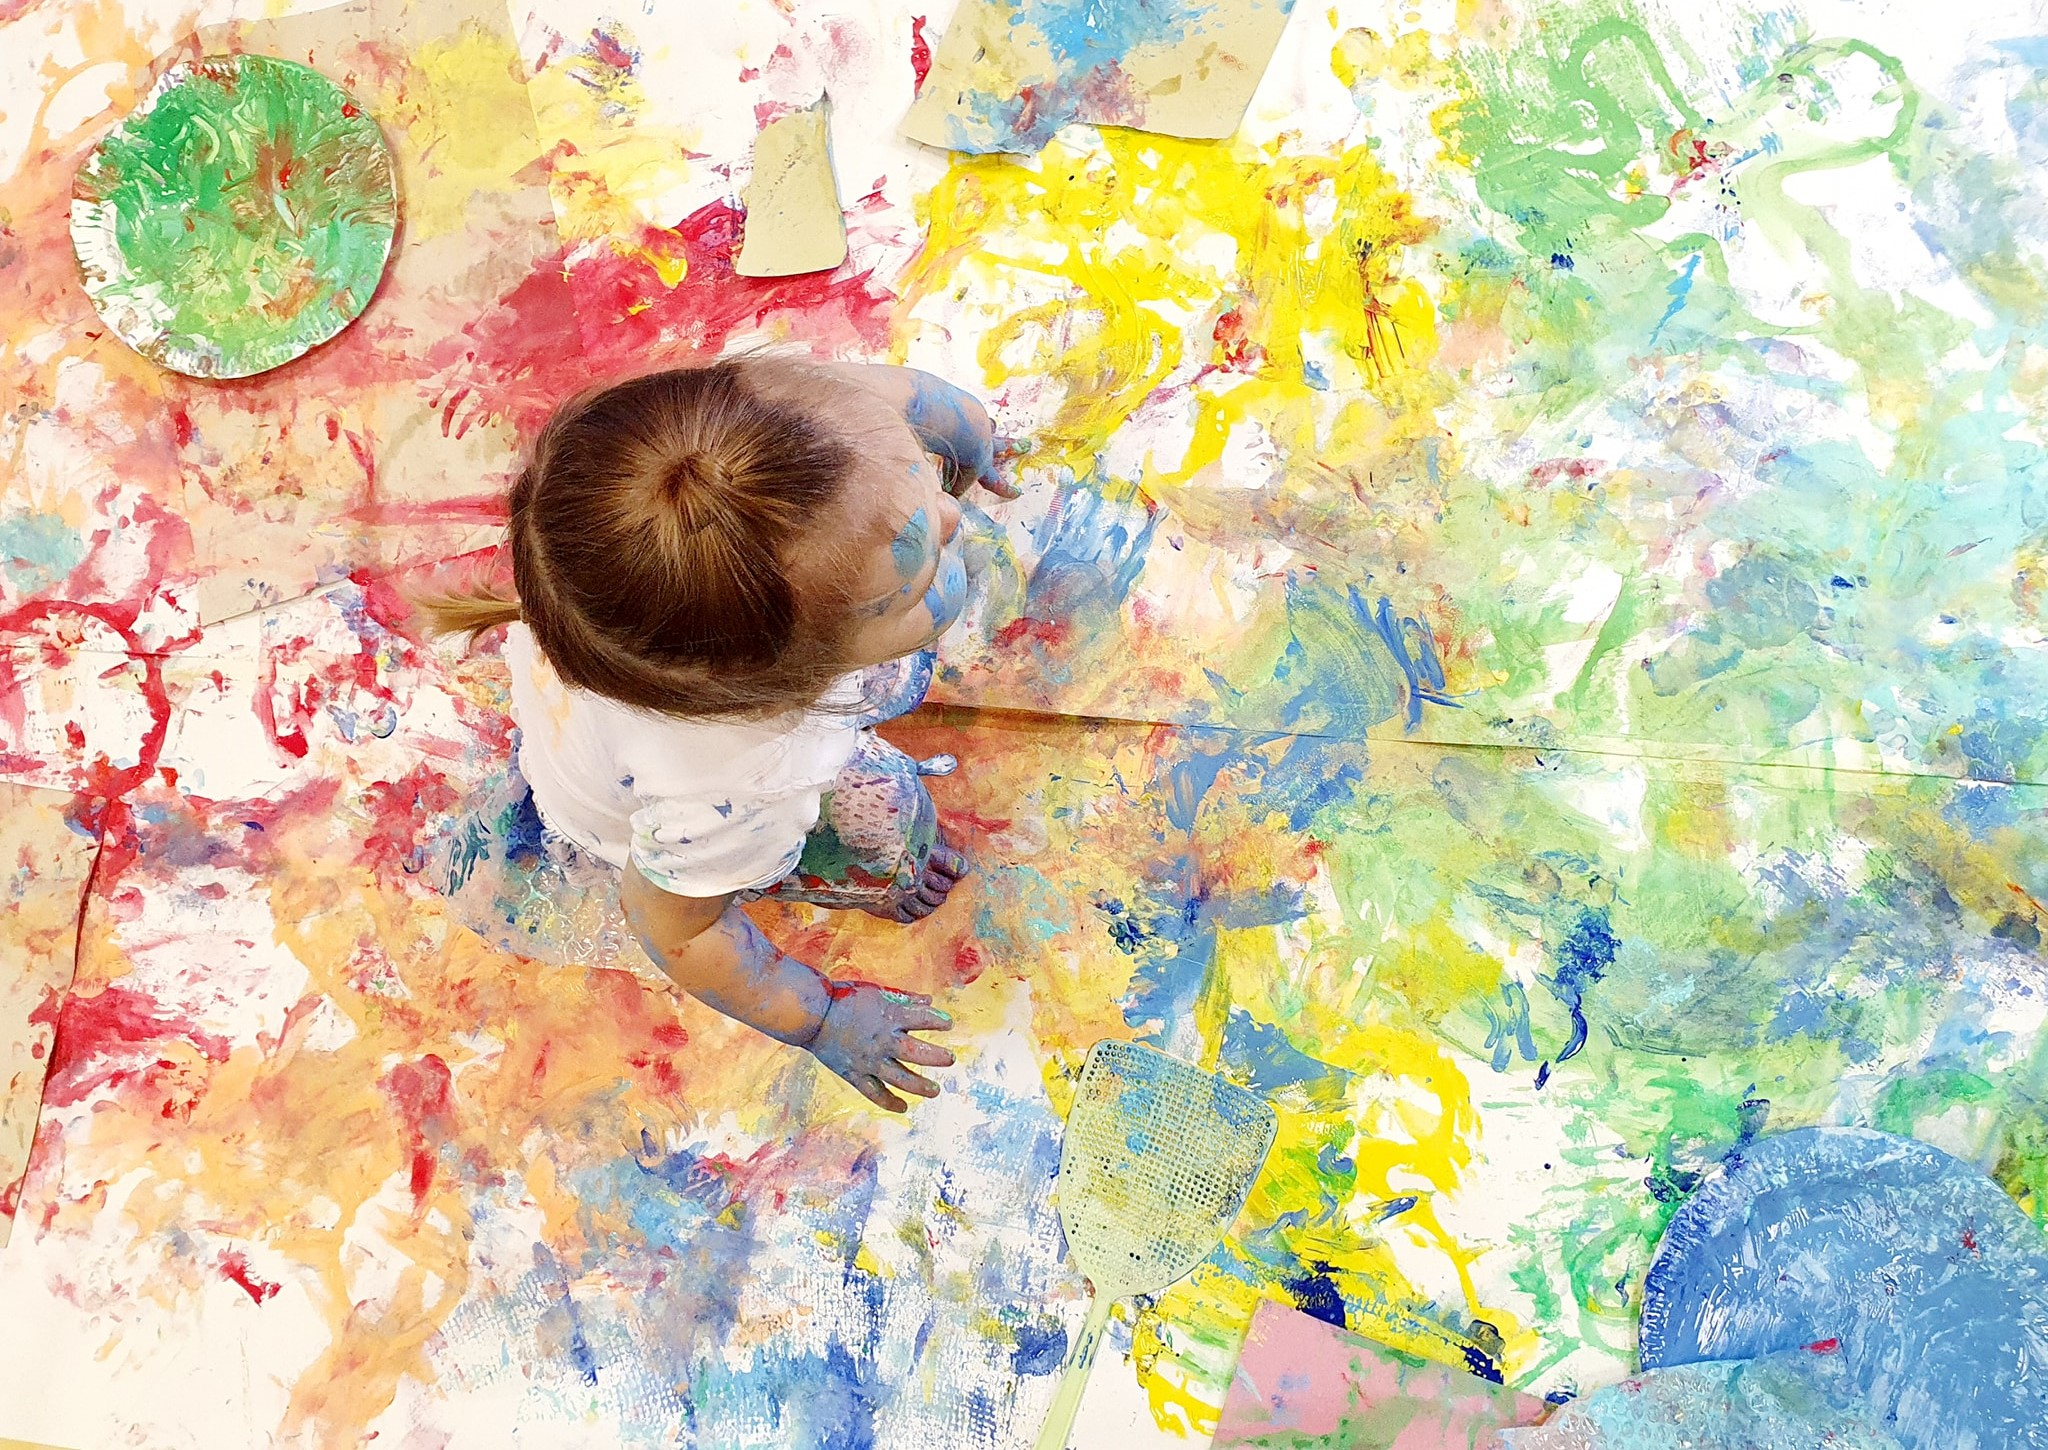 Our First ARTventurers Term!